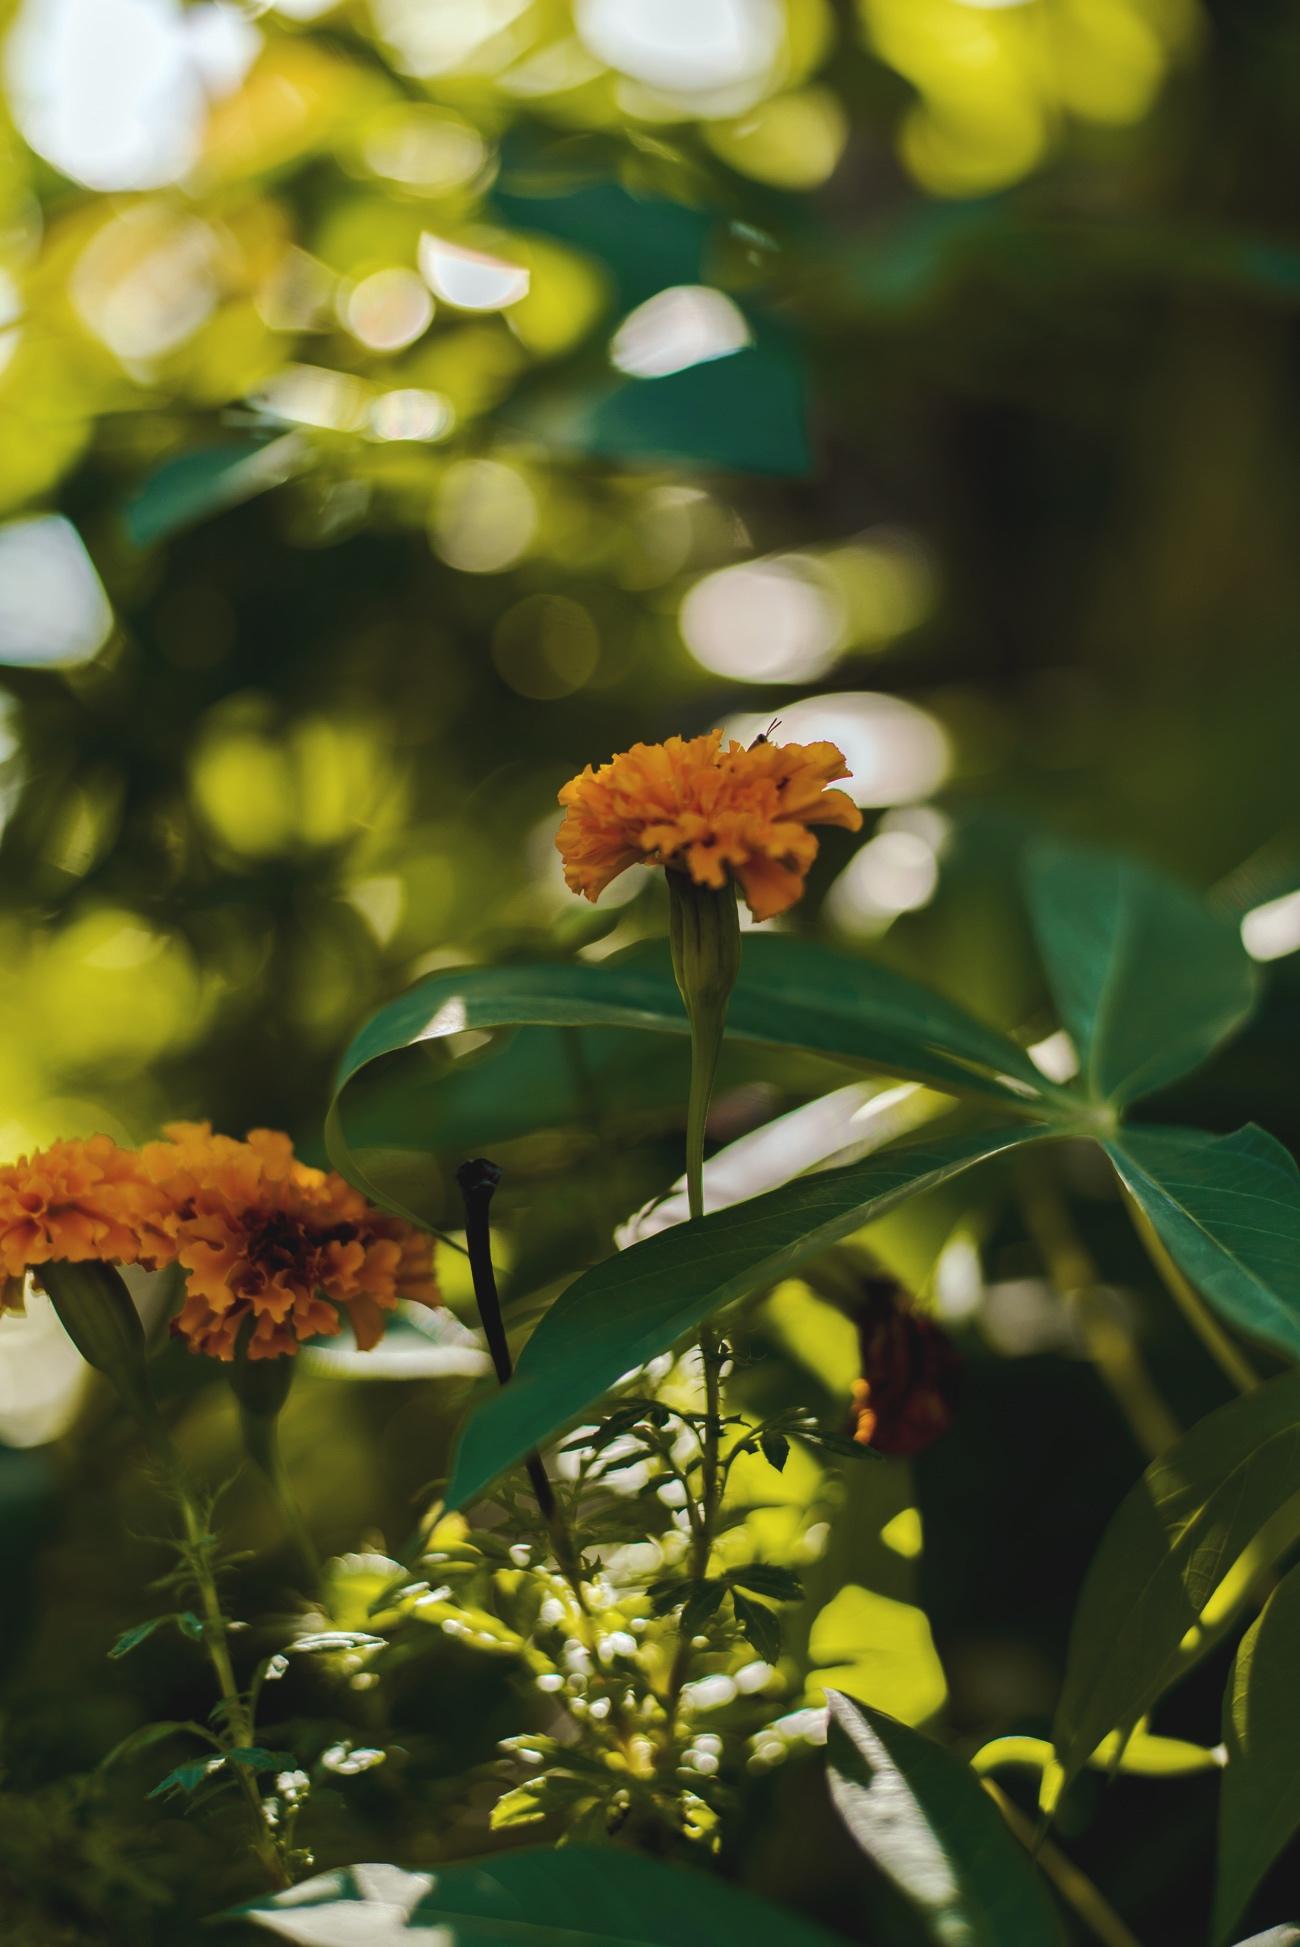 palmen-landschafts-fotografie-bali-natur-fashiioncarpet